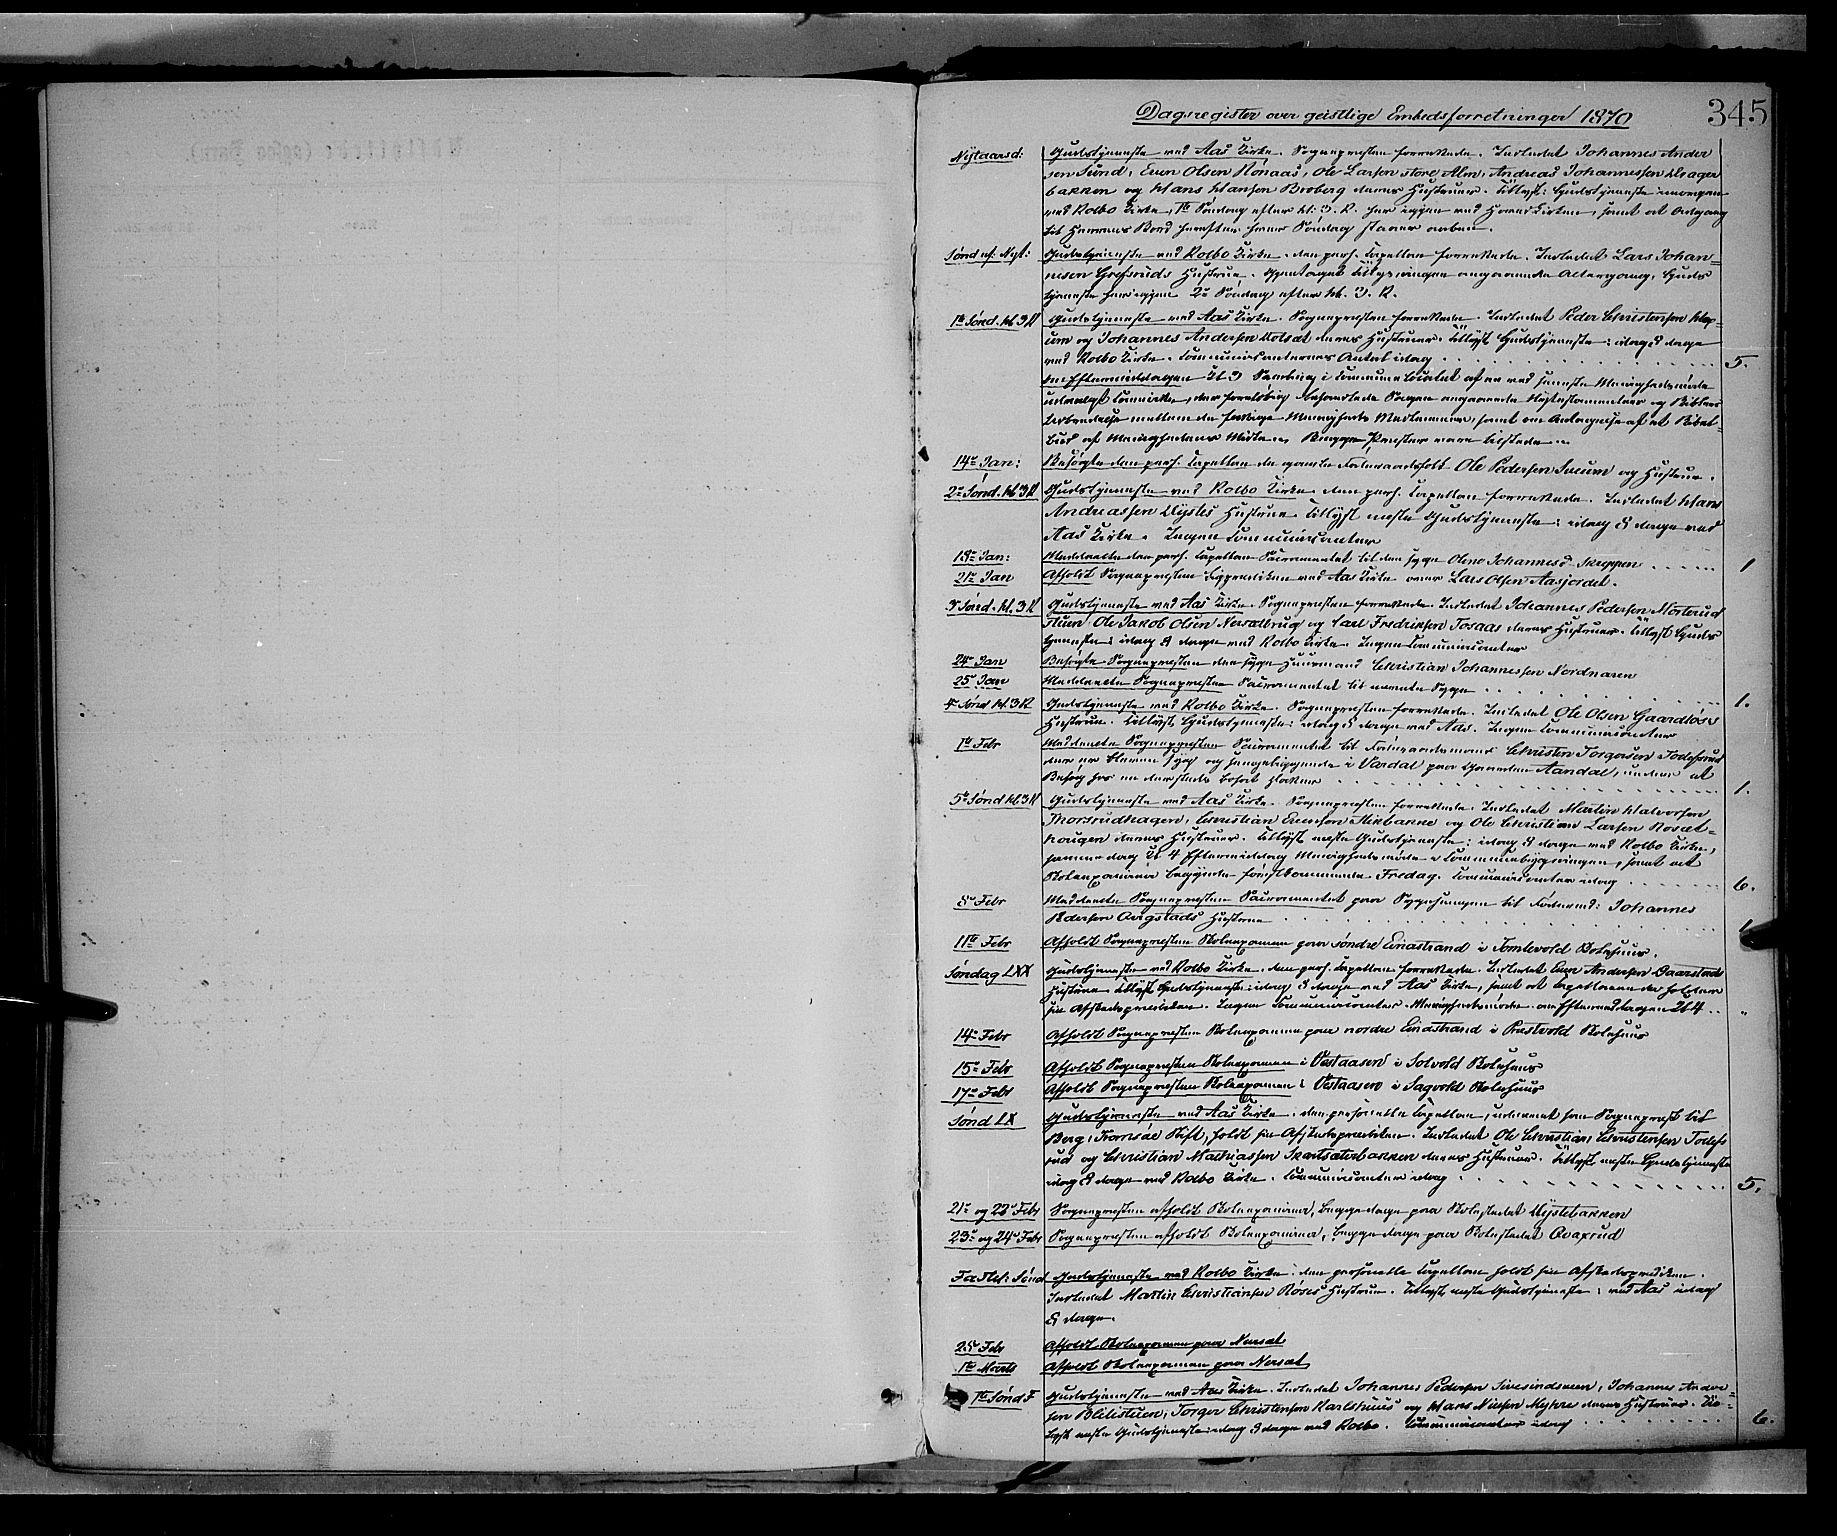 SAH, Vestre Toten prestekontor, H/Ha/Haa/L0008: Ministerialbok nr. 8, 1870-1877, s. 345